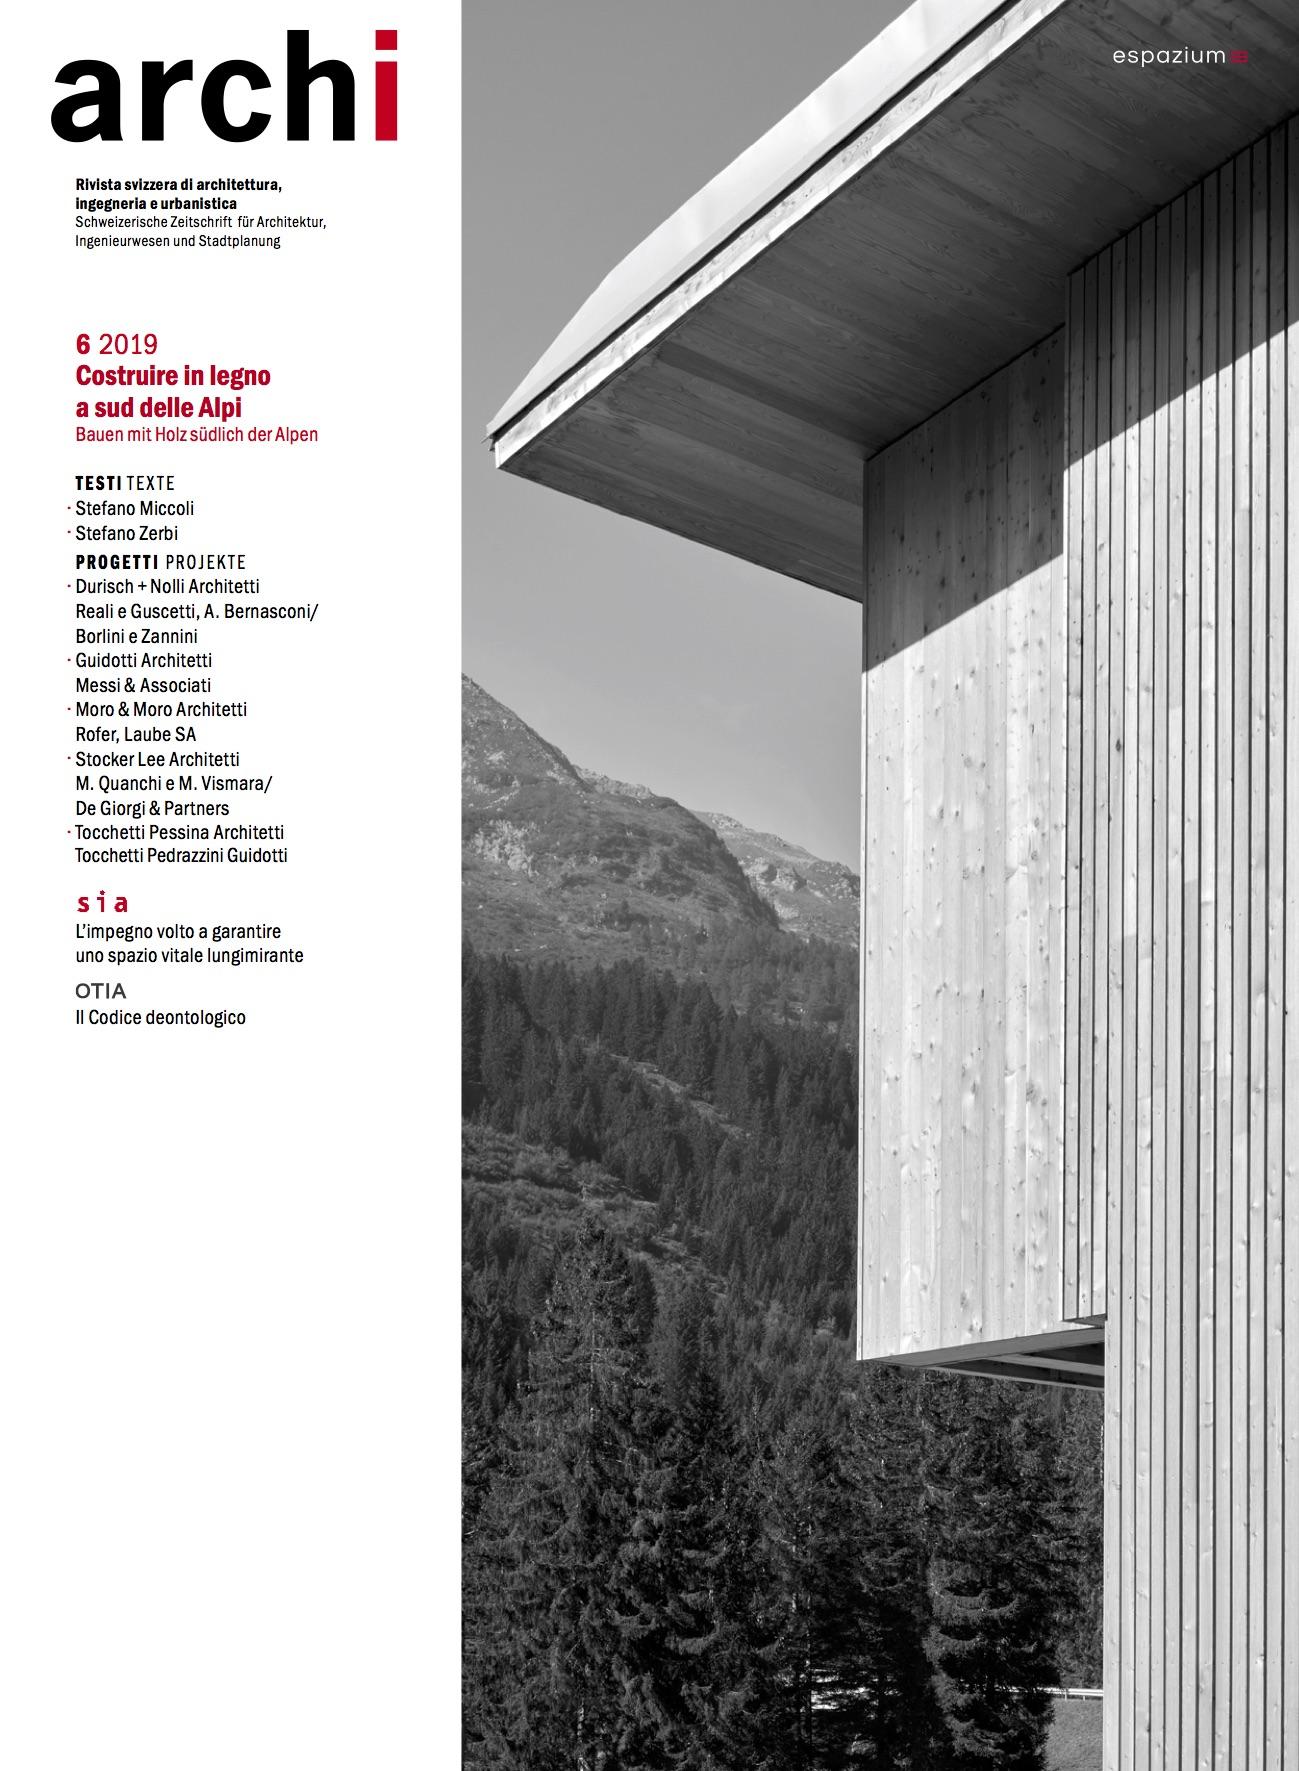 Carpentieri Edili In Svizzera svizzera e africa: uno sguardo bilaterale | espazium